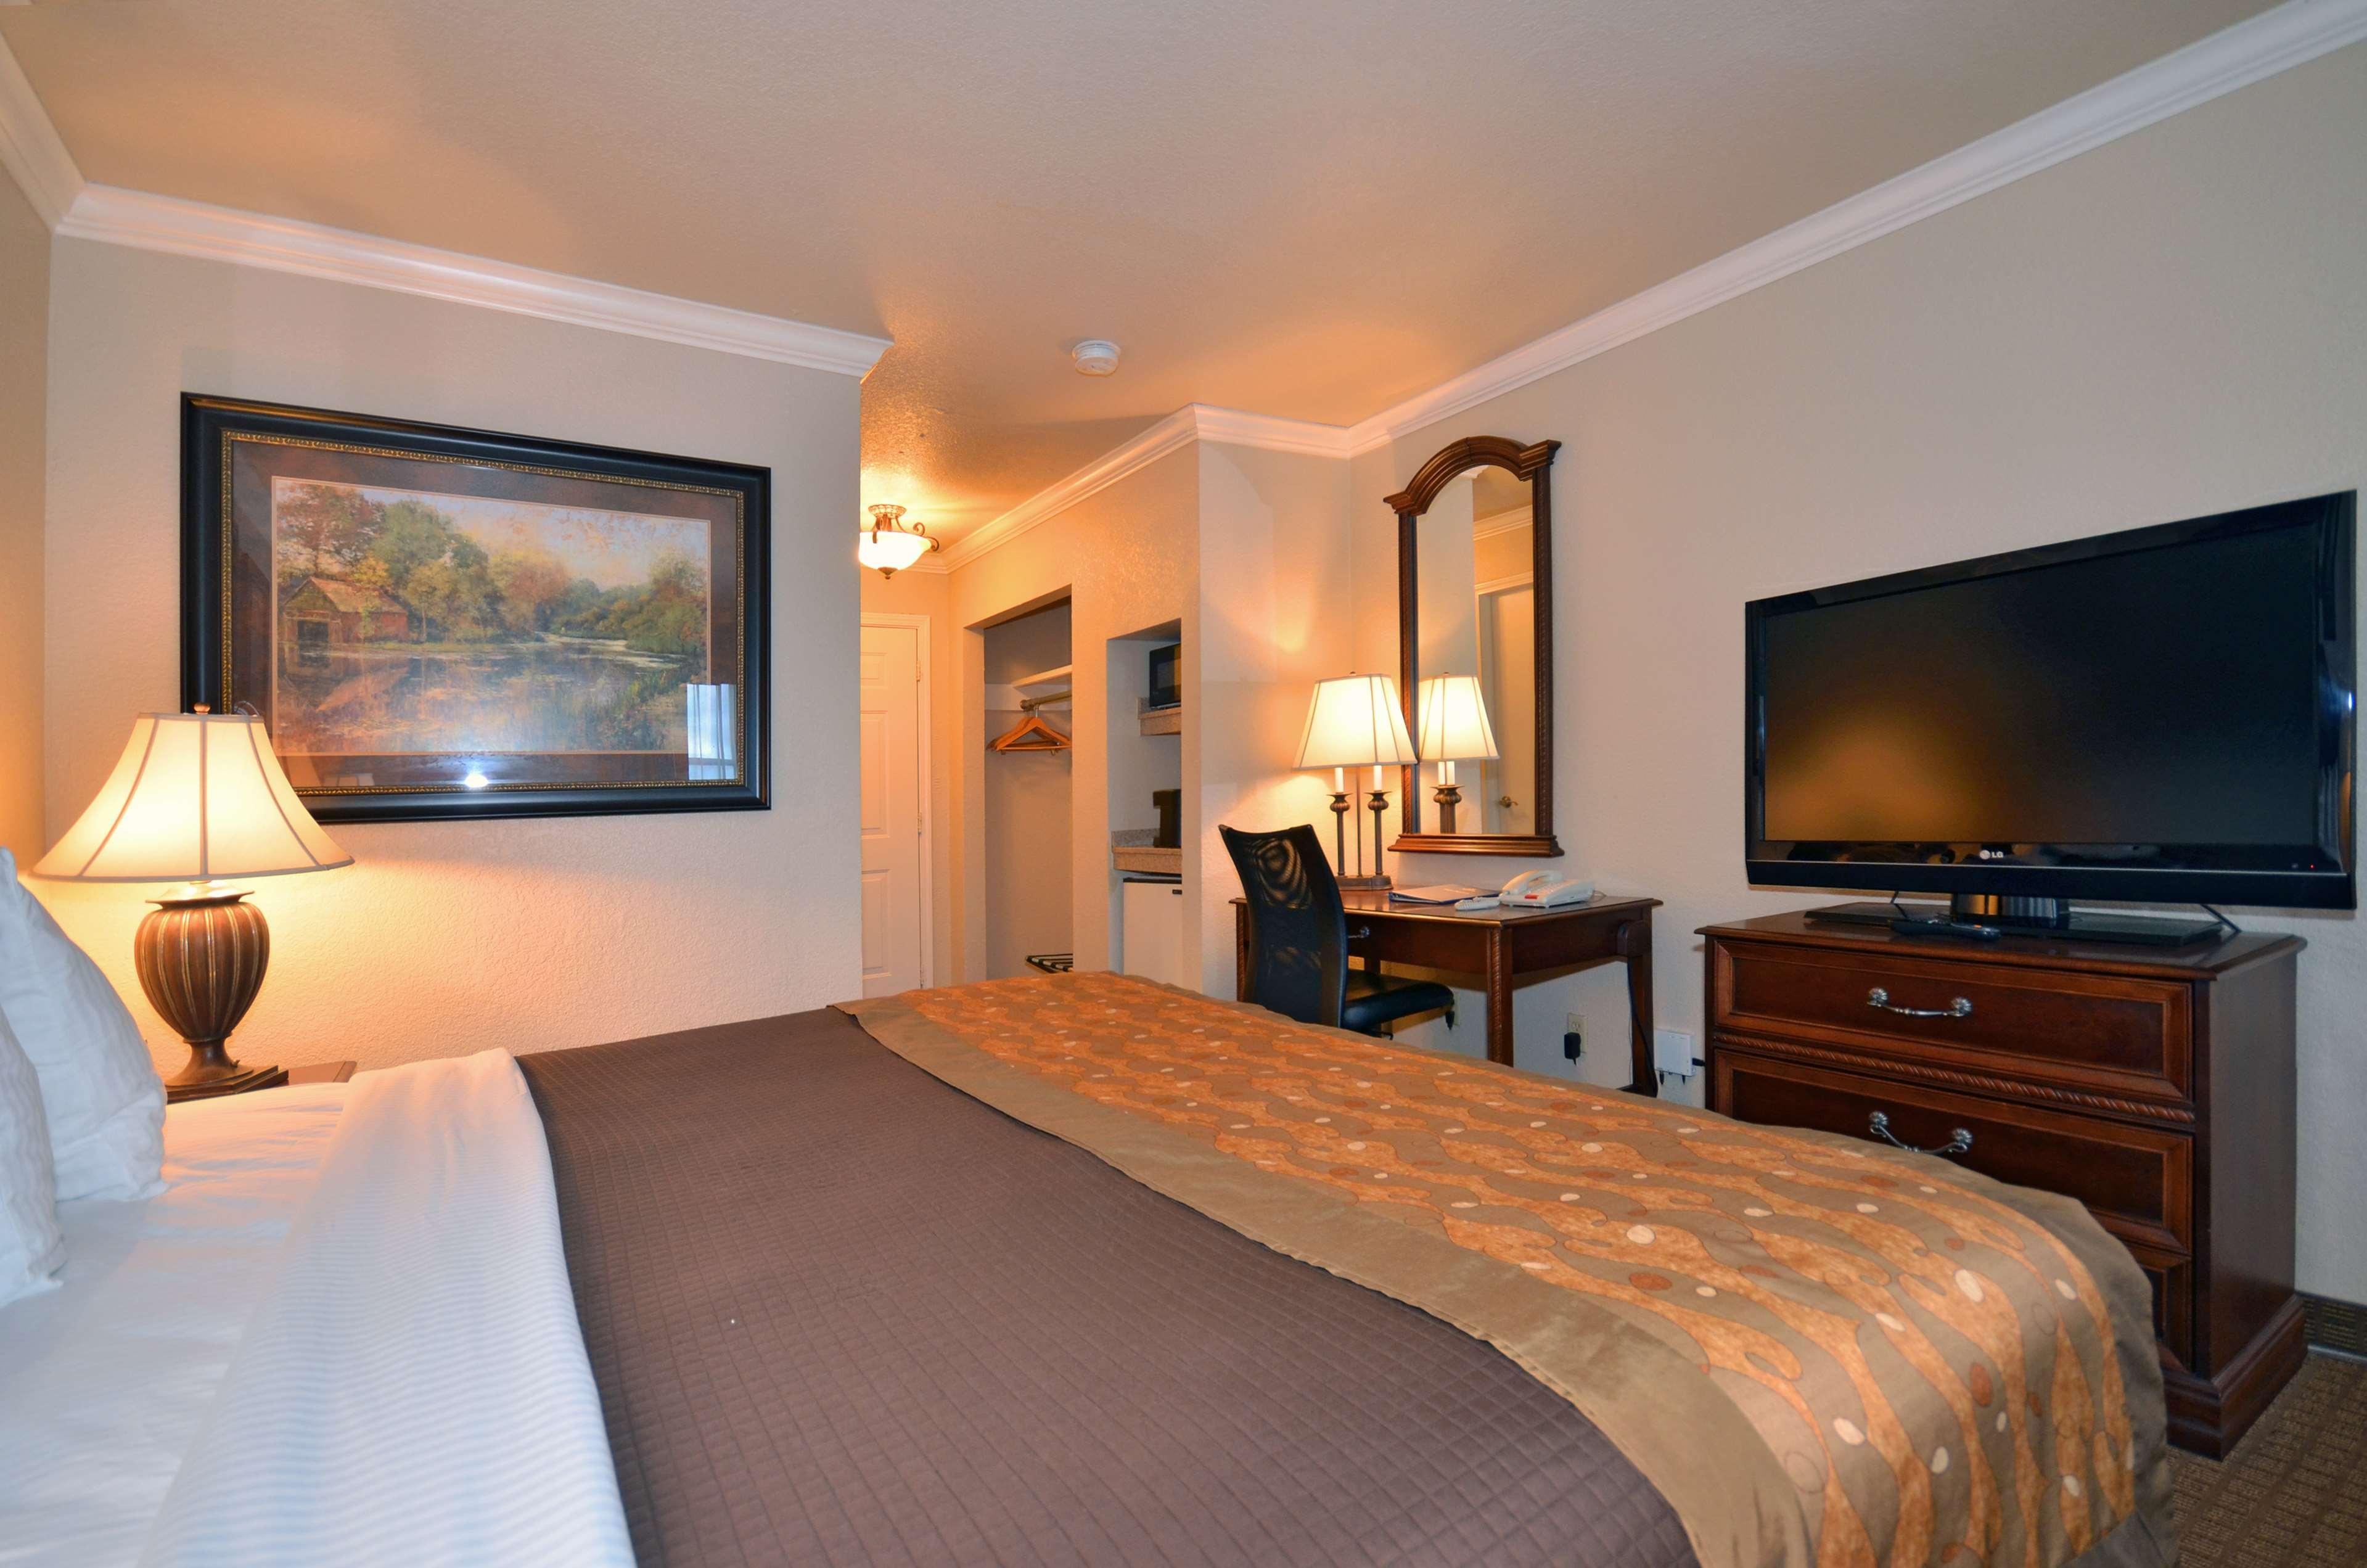 Best Western Inn of McAlester image 21